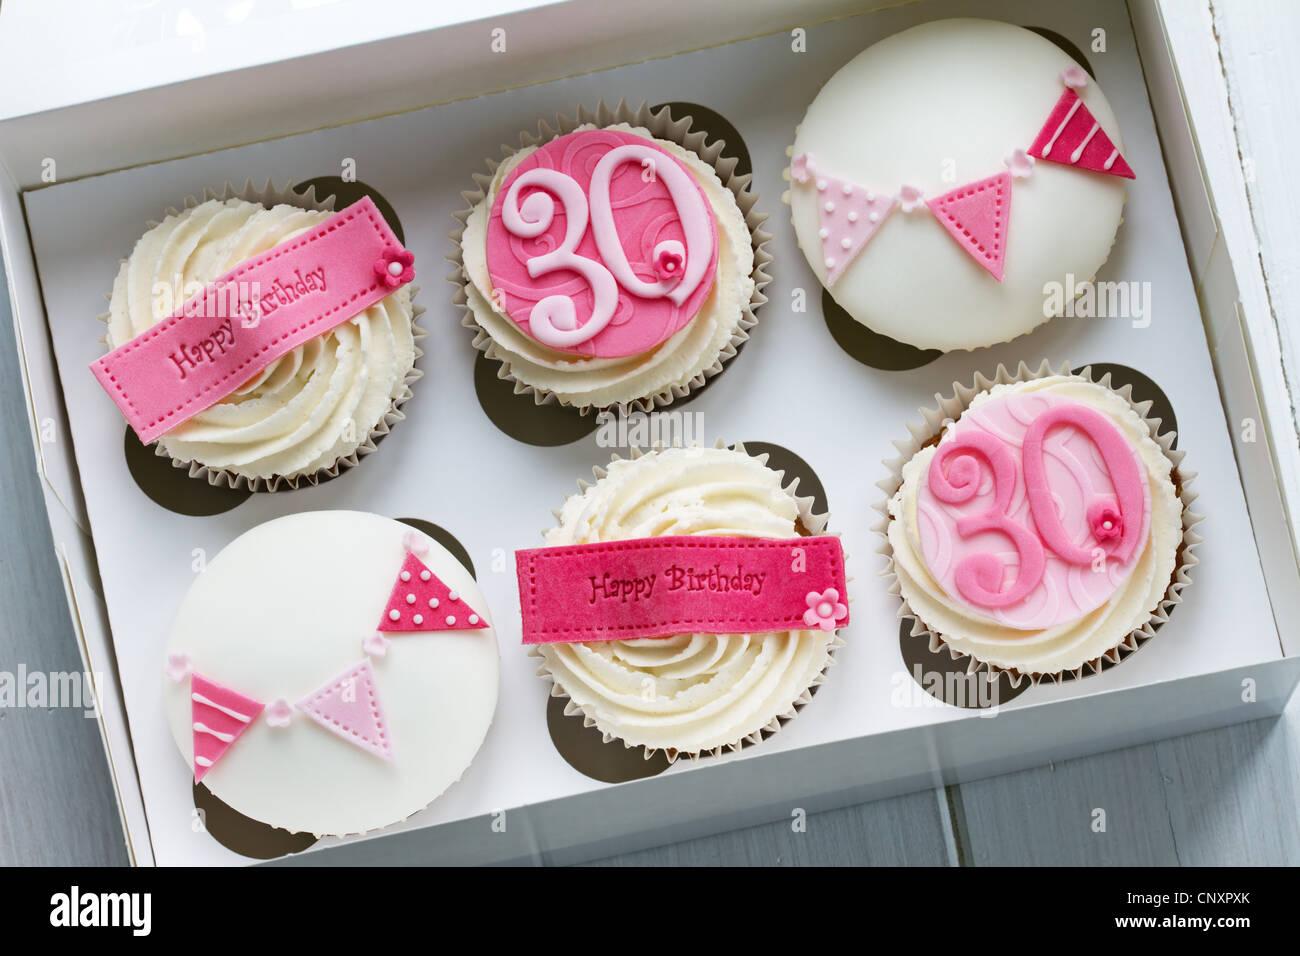 Amazing 30Th Birthday Cupcakes Stock Photo 47917259 Alamy Funny Birthday Cards Online Inifofree Goldxyz